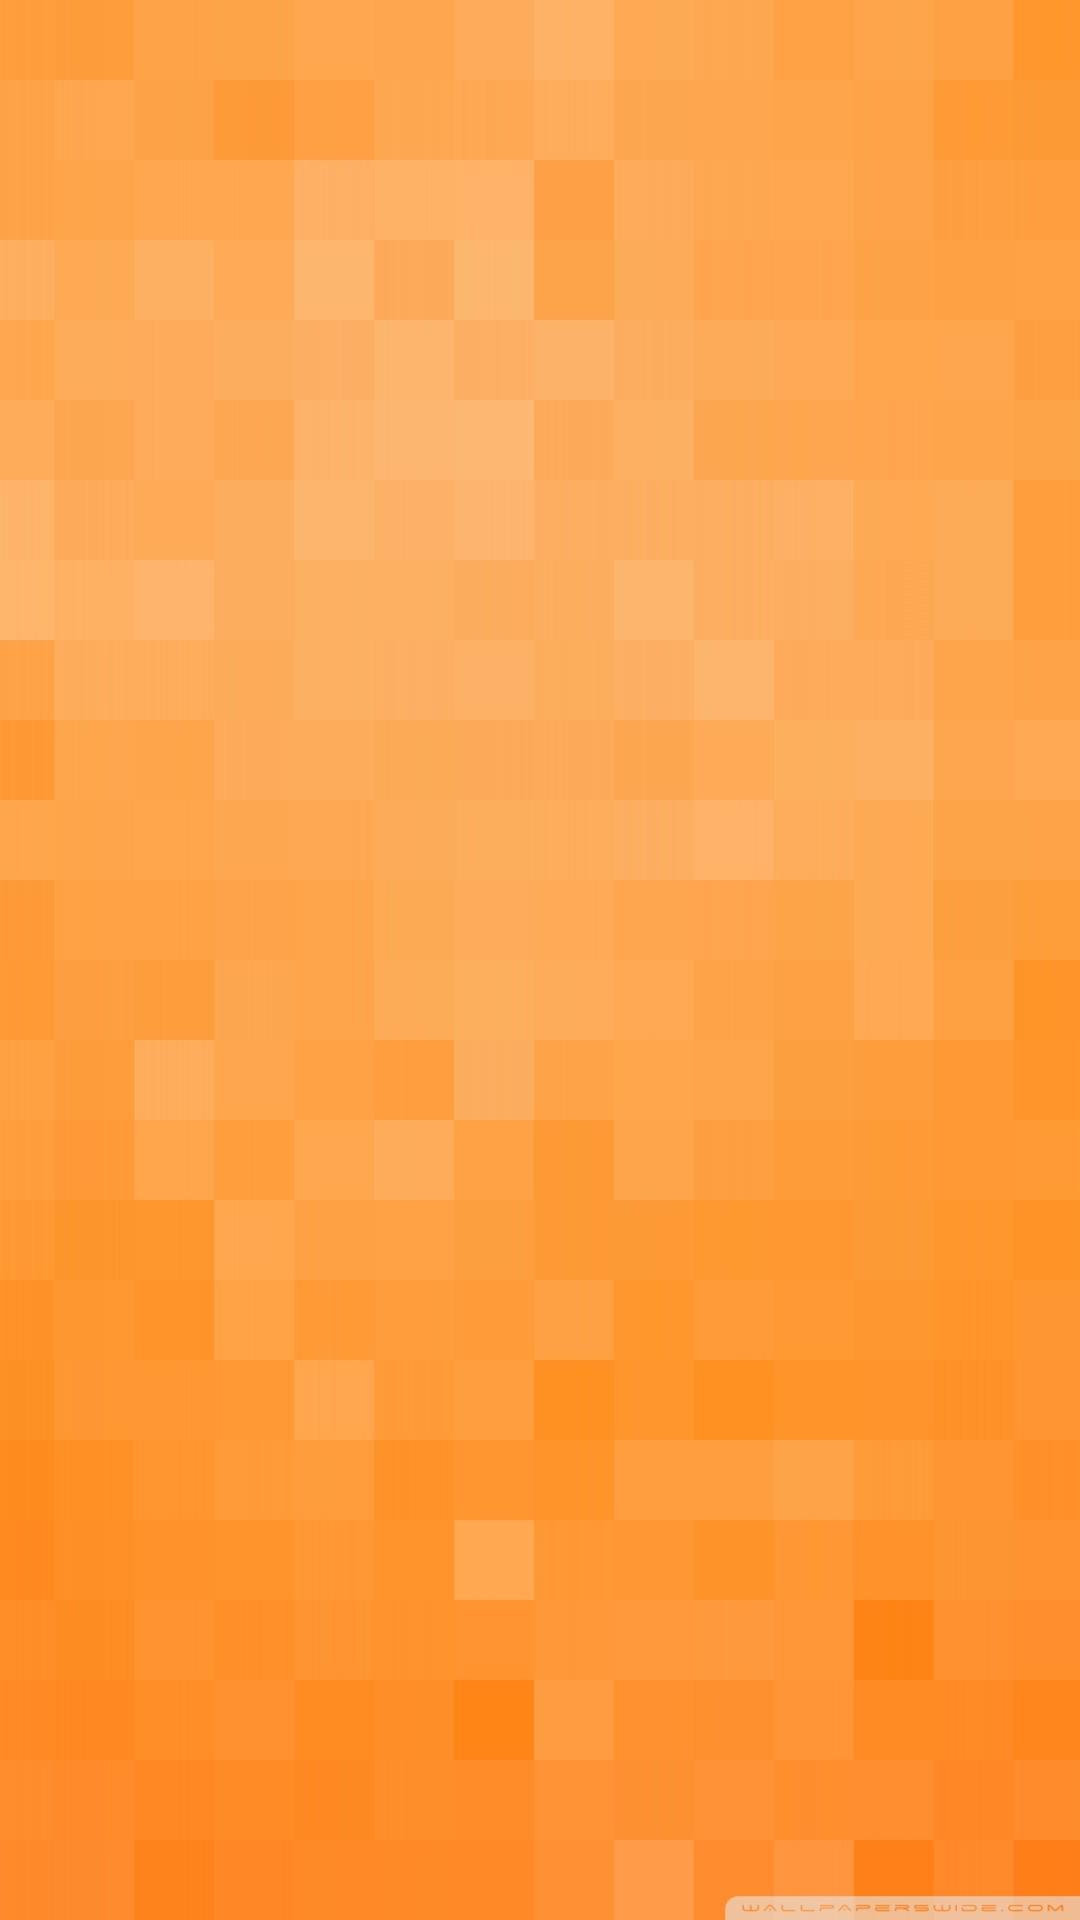 Free Orange Pixels Background phone wallpaper by shawnabaxter